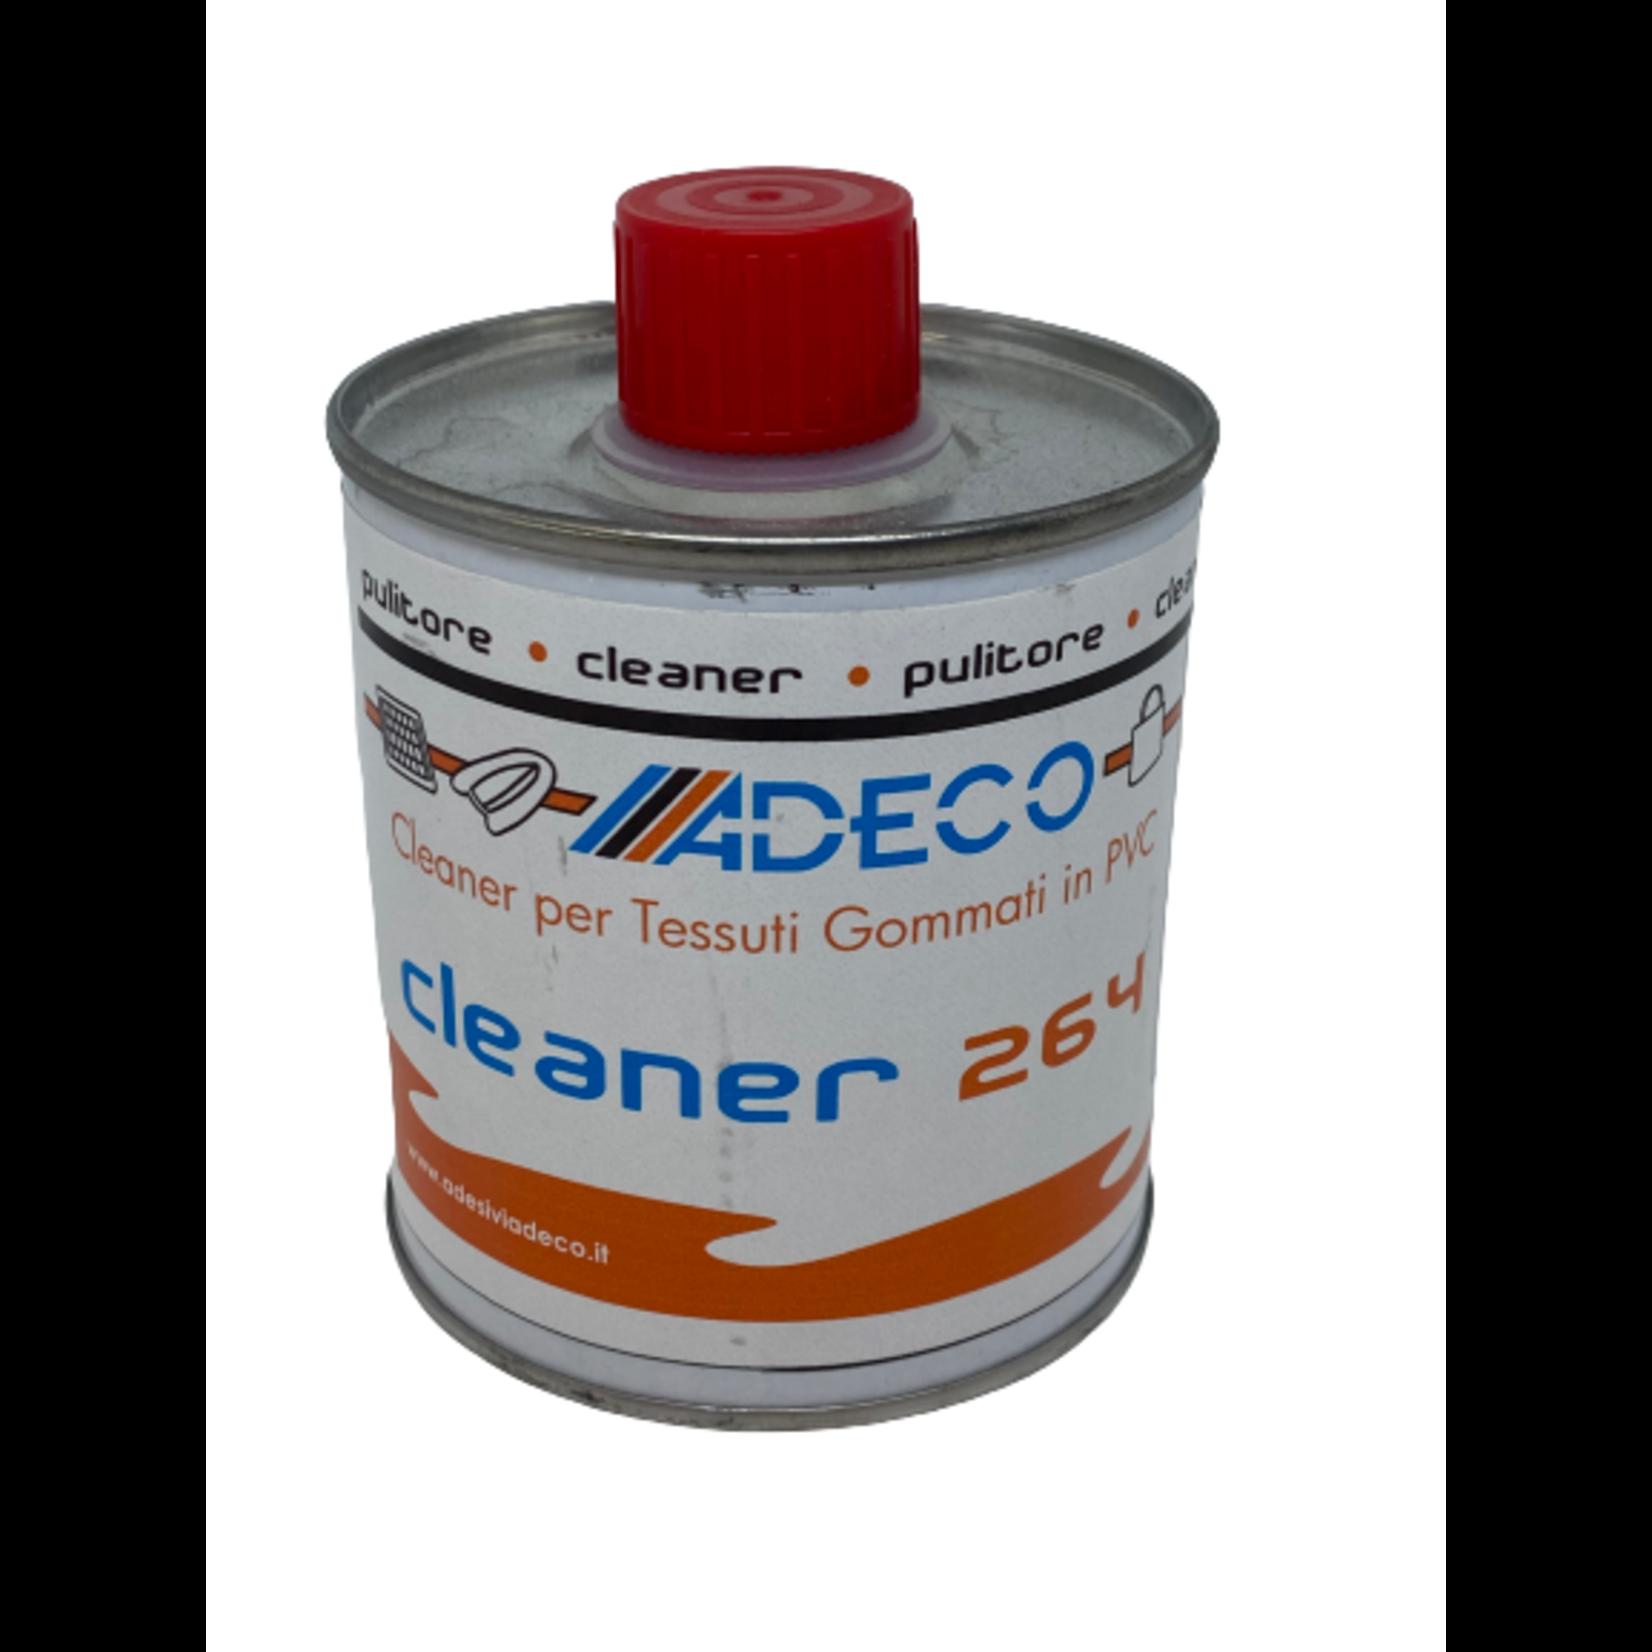 Divers Thinner voor PVC materiaal 250ml